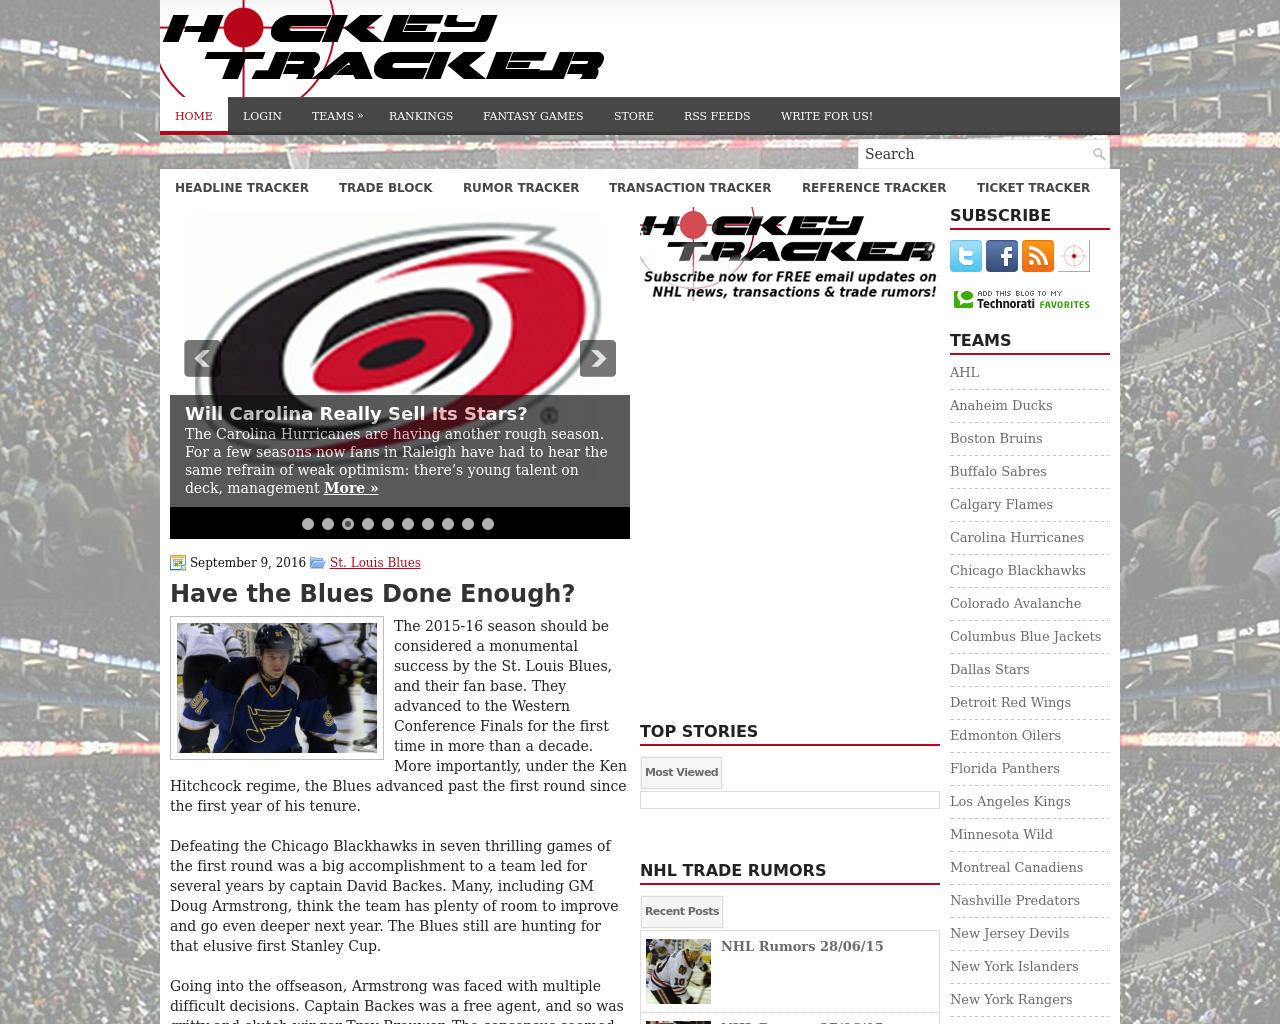 Hockey-Tracker-Advertising-Reviews-Pricing